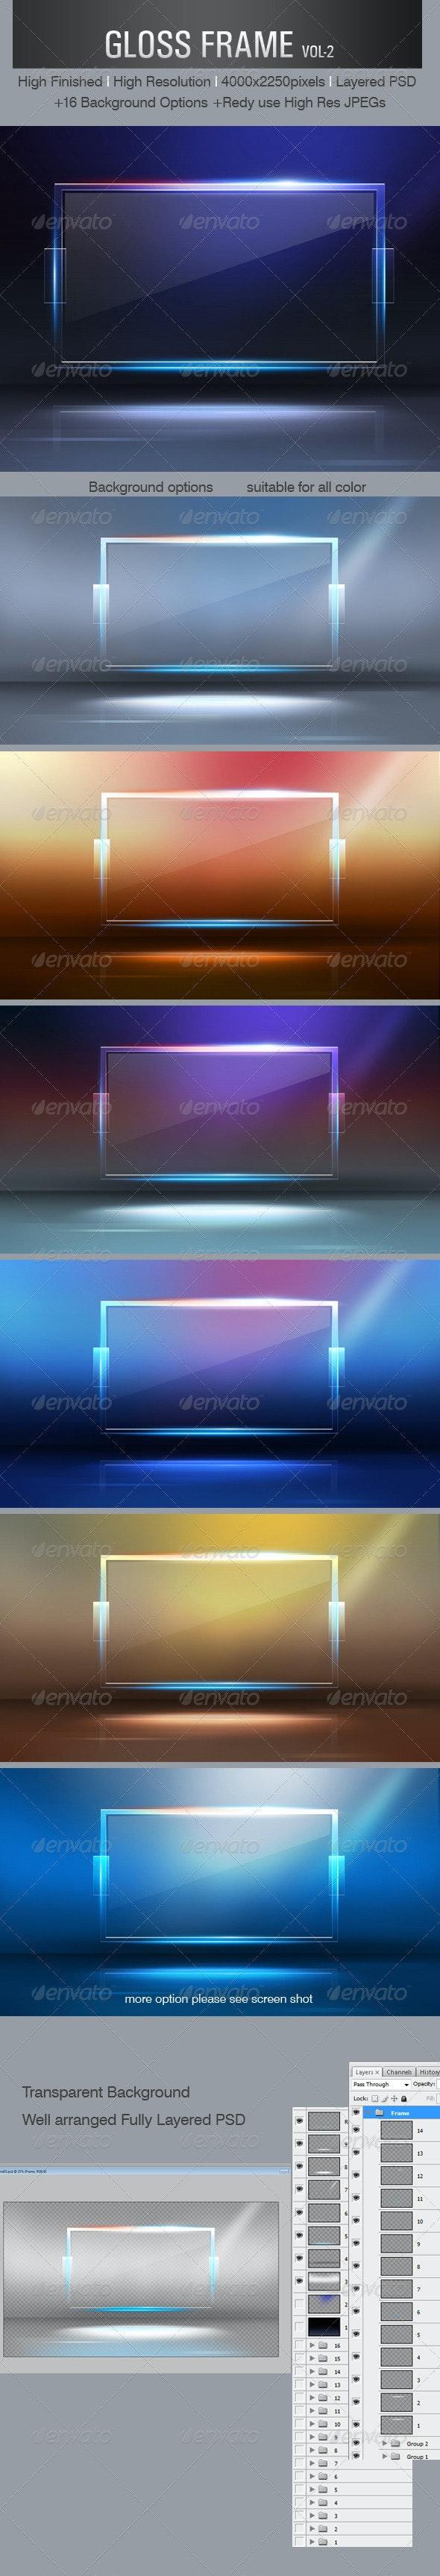 Gloss Frame - 3D Backgrounds